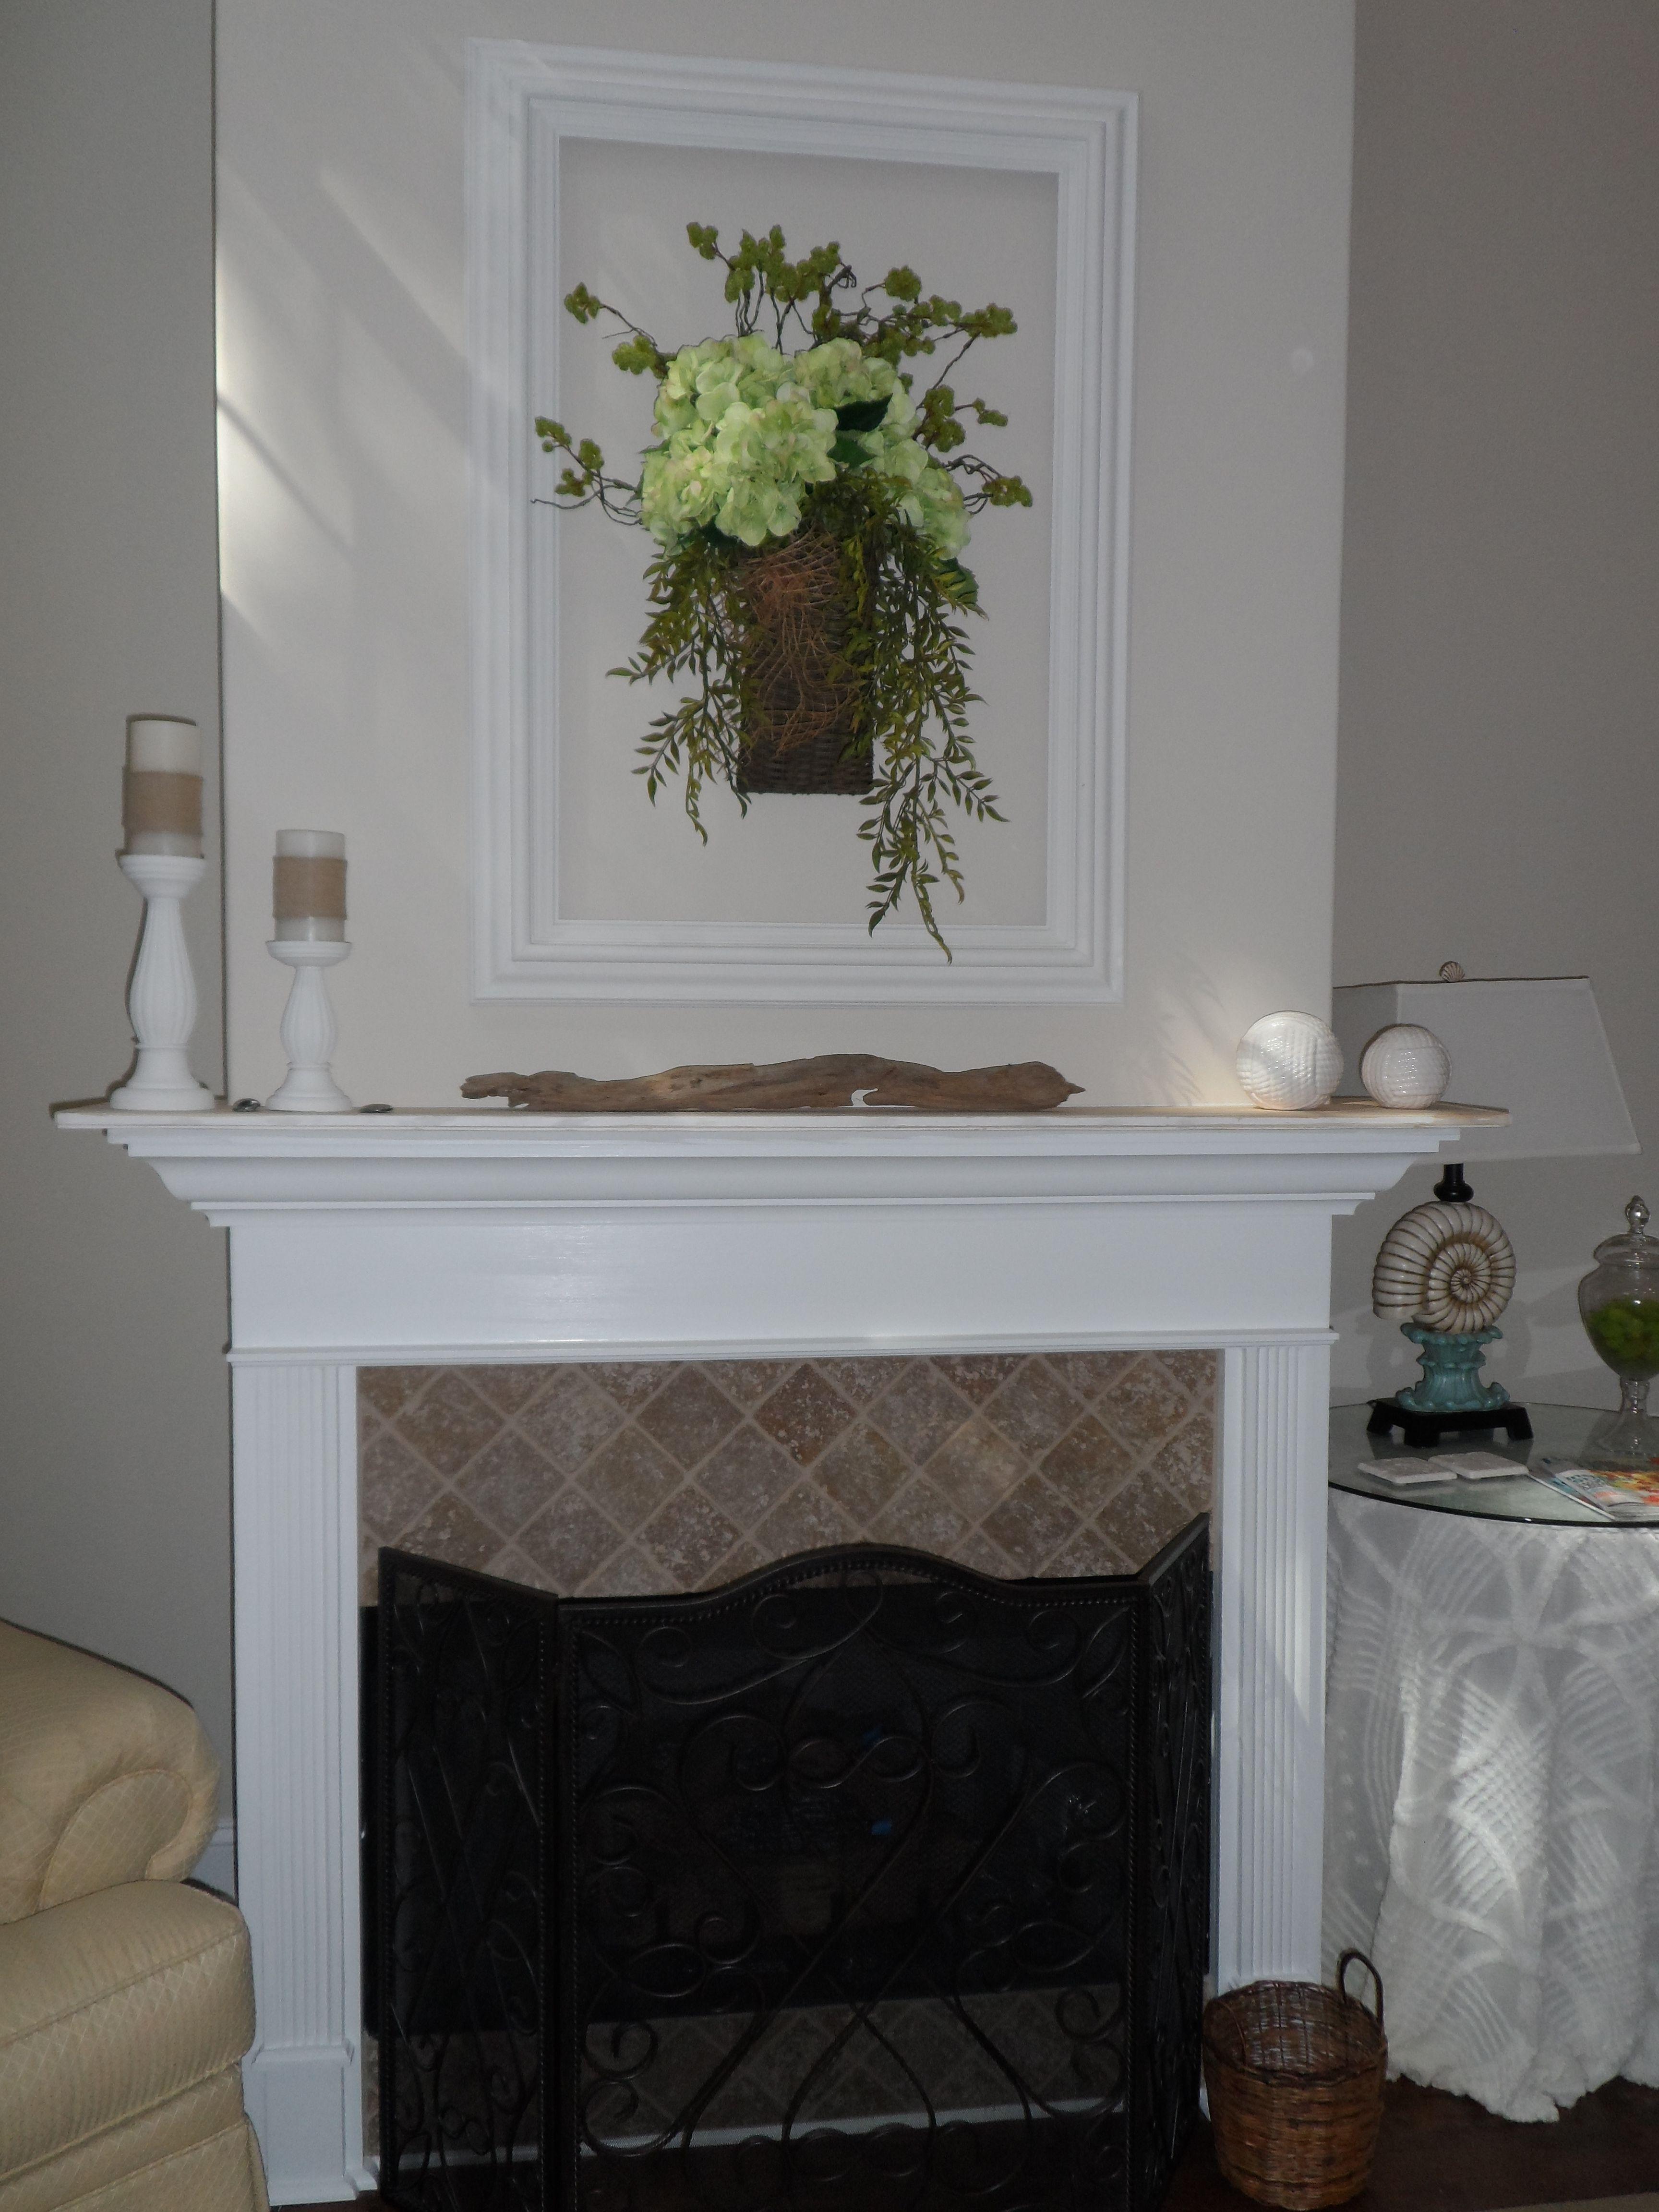 This was the black frame in the kitchen.  Same flower arrangement.